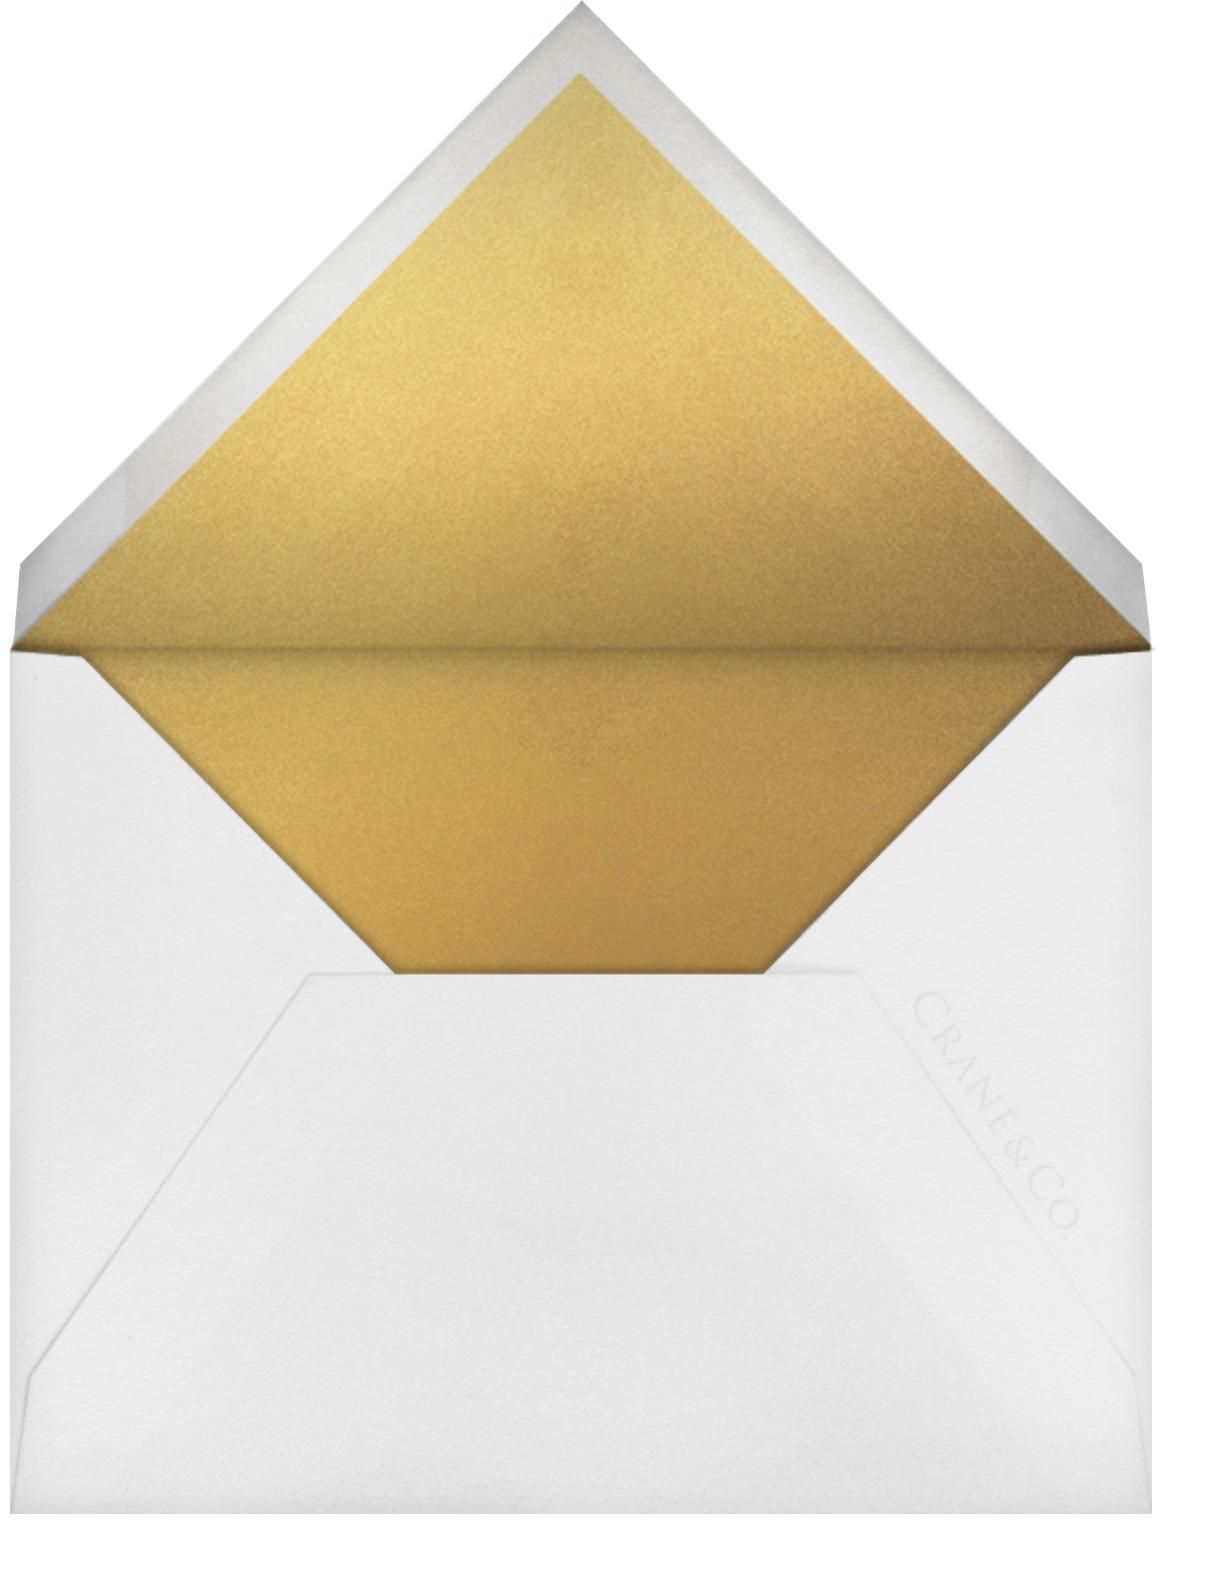 Love Knots - Gold - Oscar de la Renta - Printable invitations - envelope back